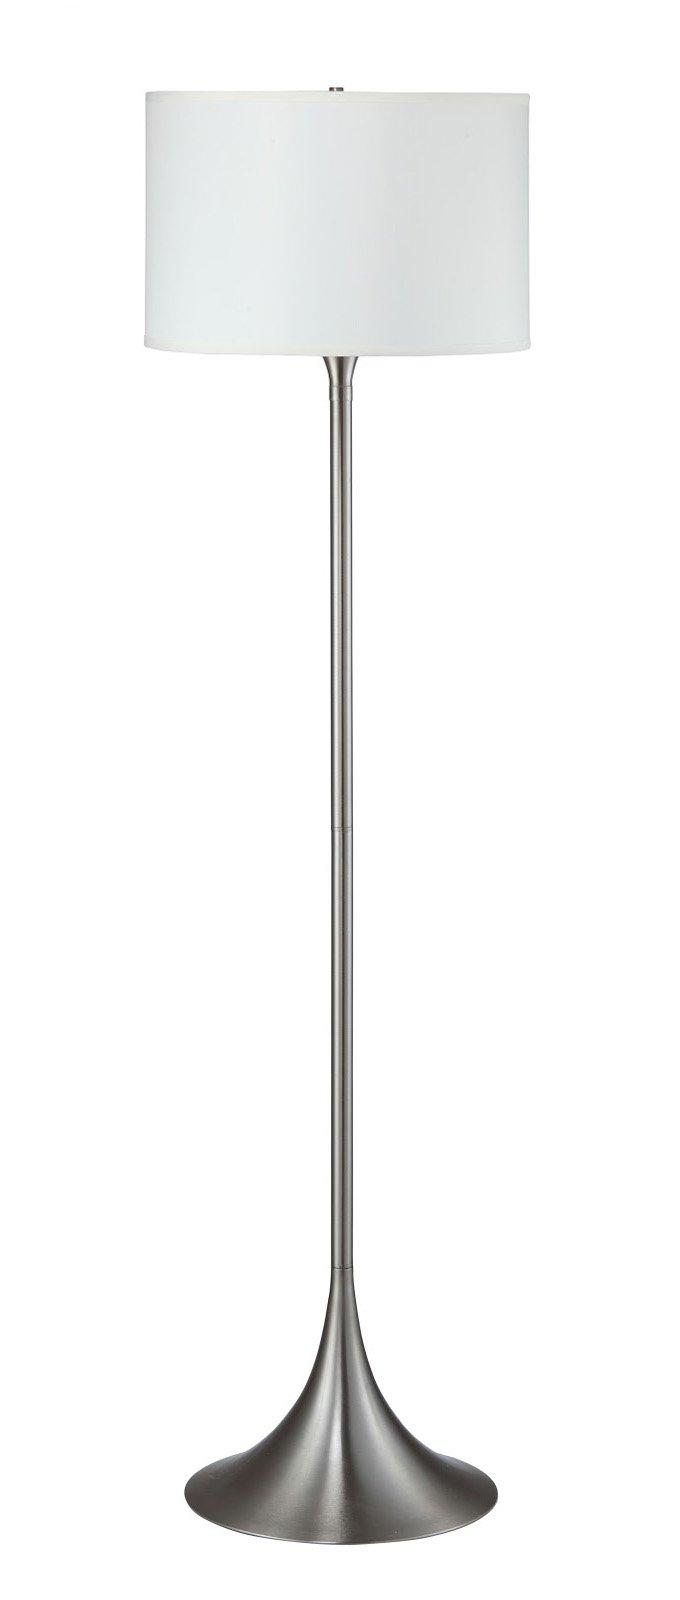 Hongville Brushed Steel Base White Shade Floor Lamp